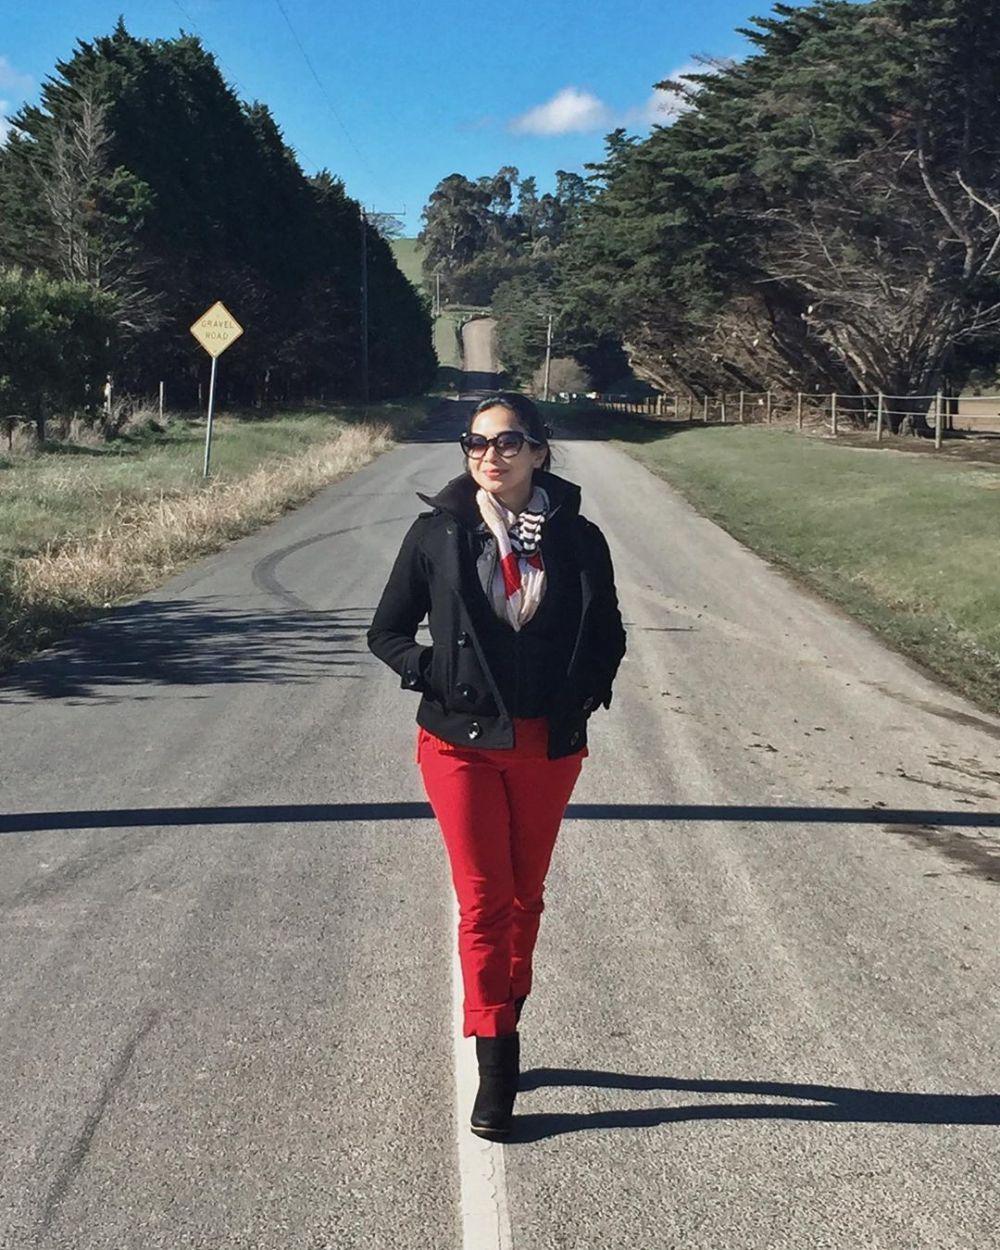 Intip 10 Inspirasi Outfit Street Style ala Feni Rose